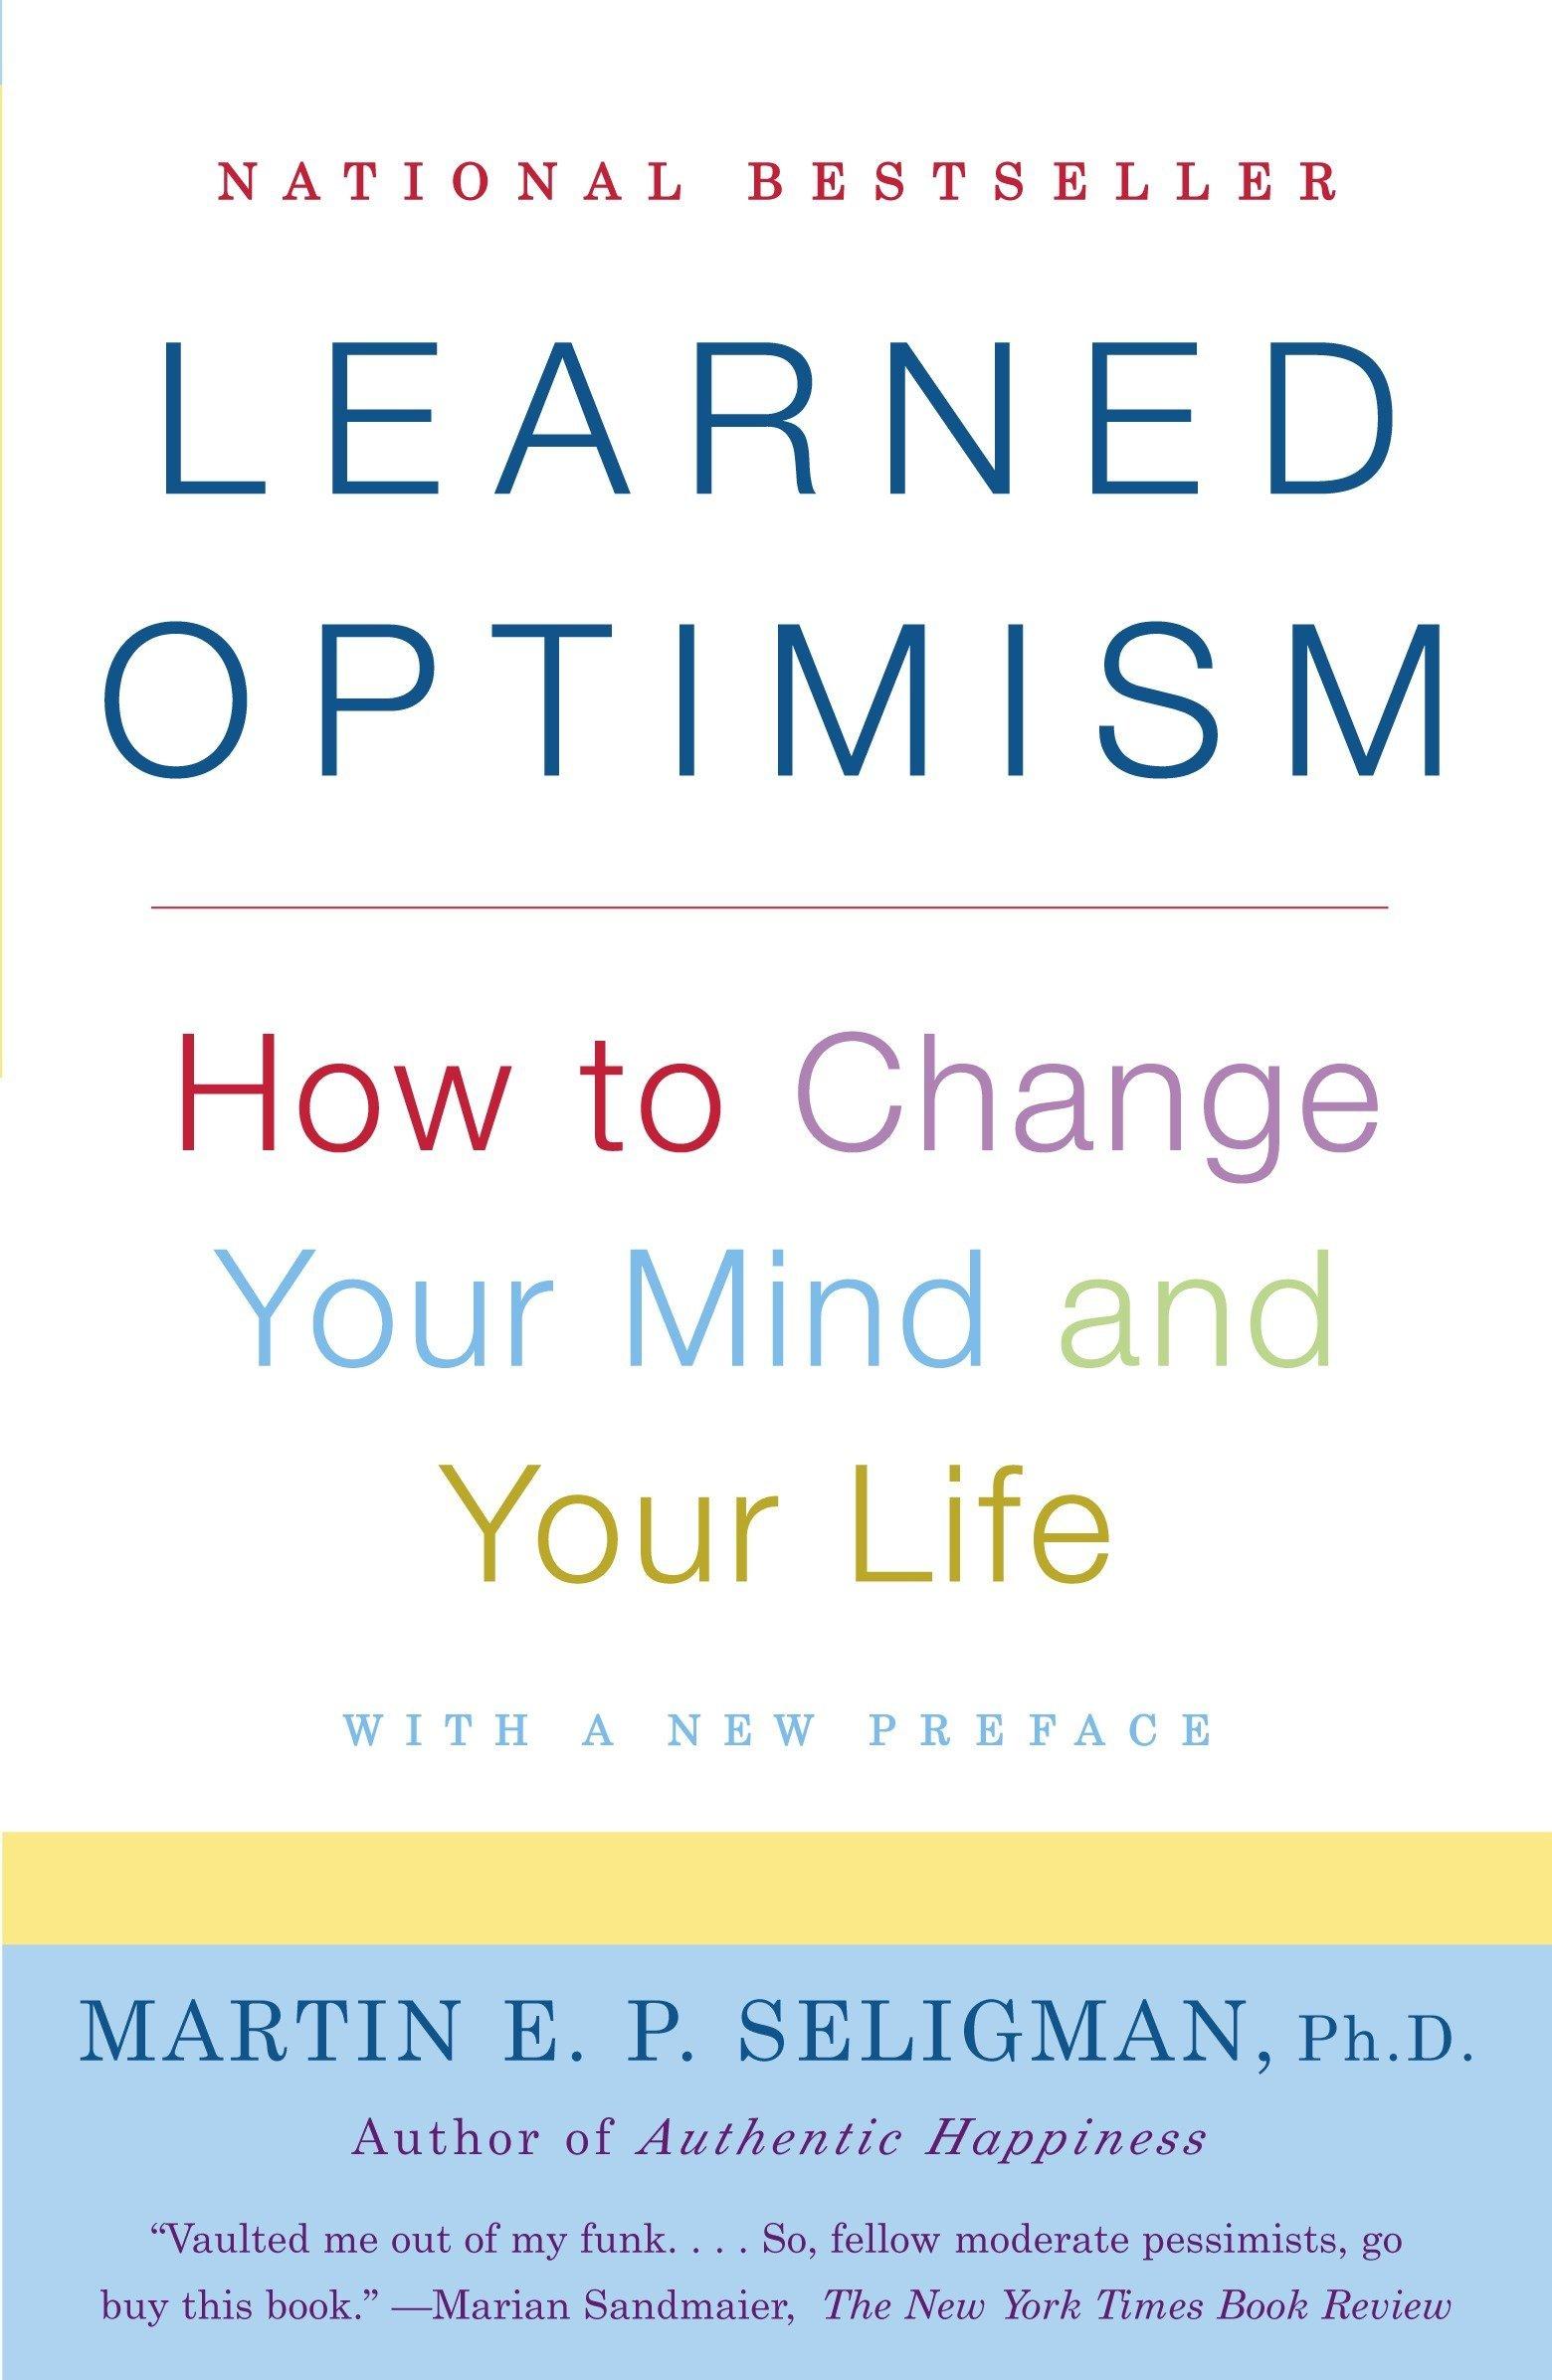 Learned Optimism